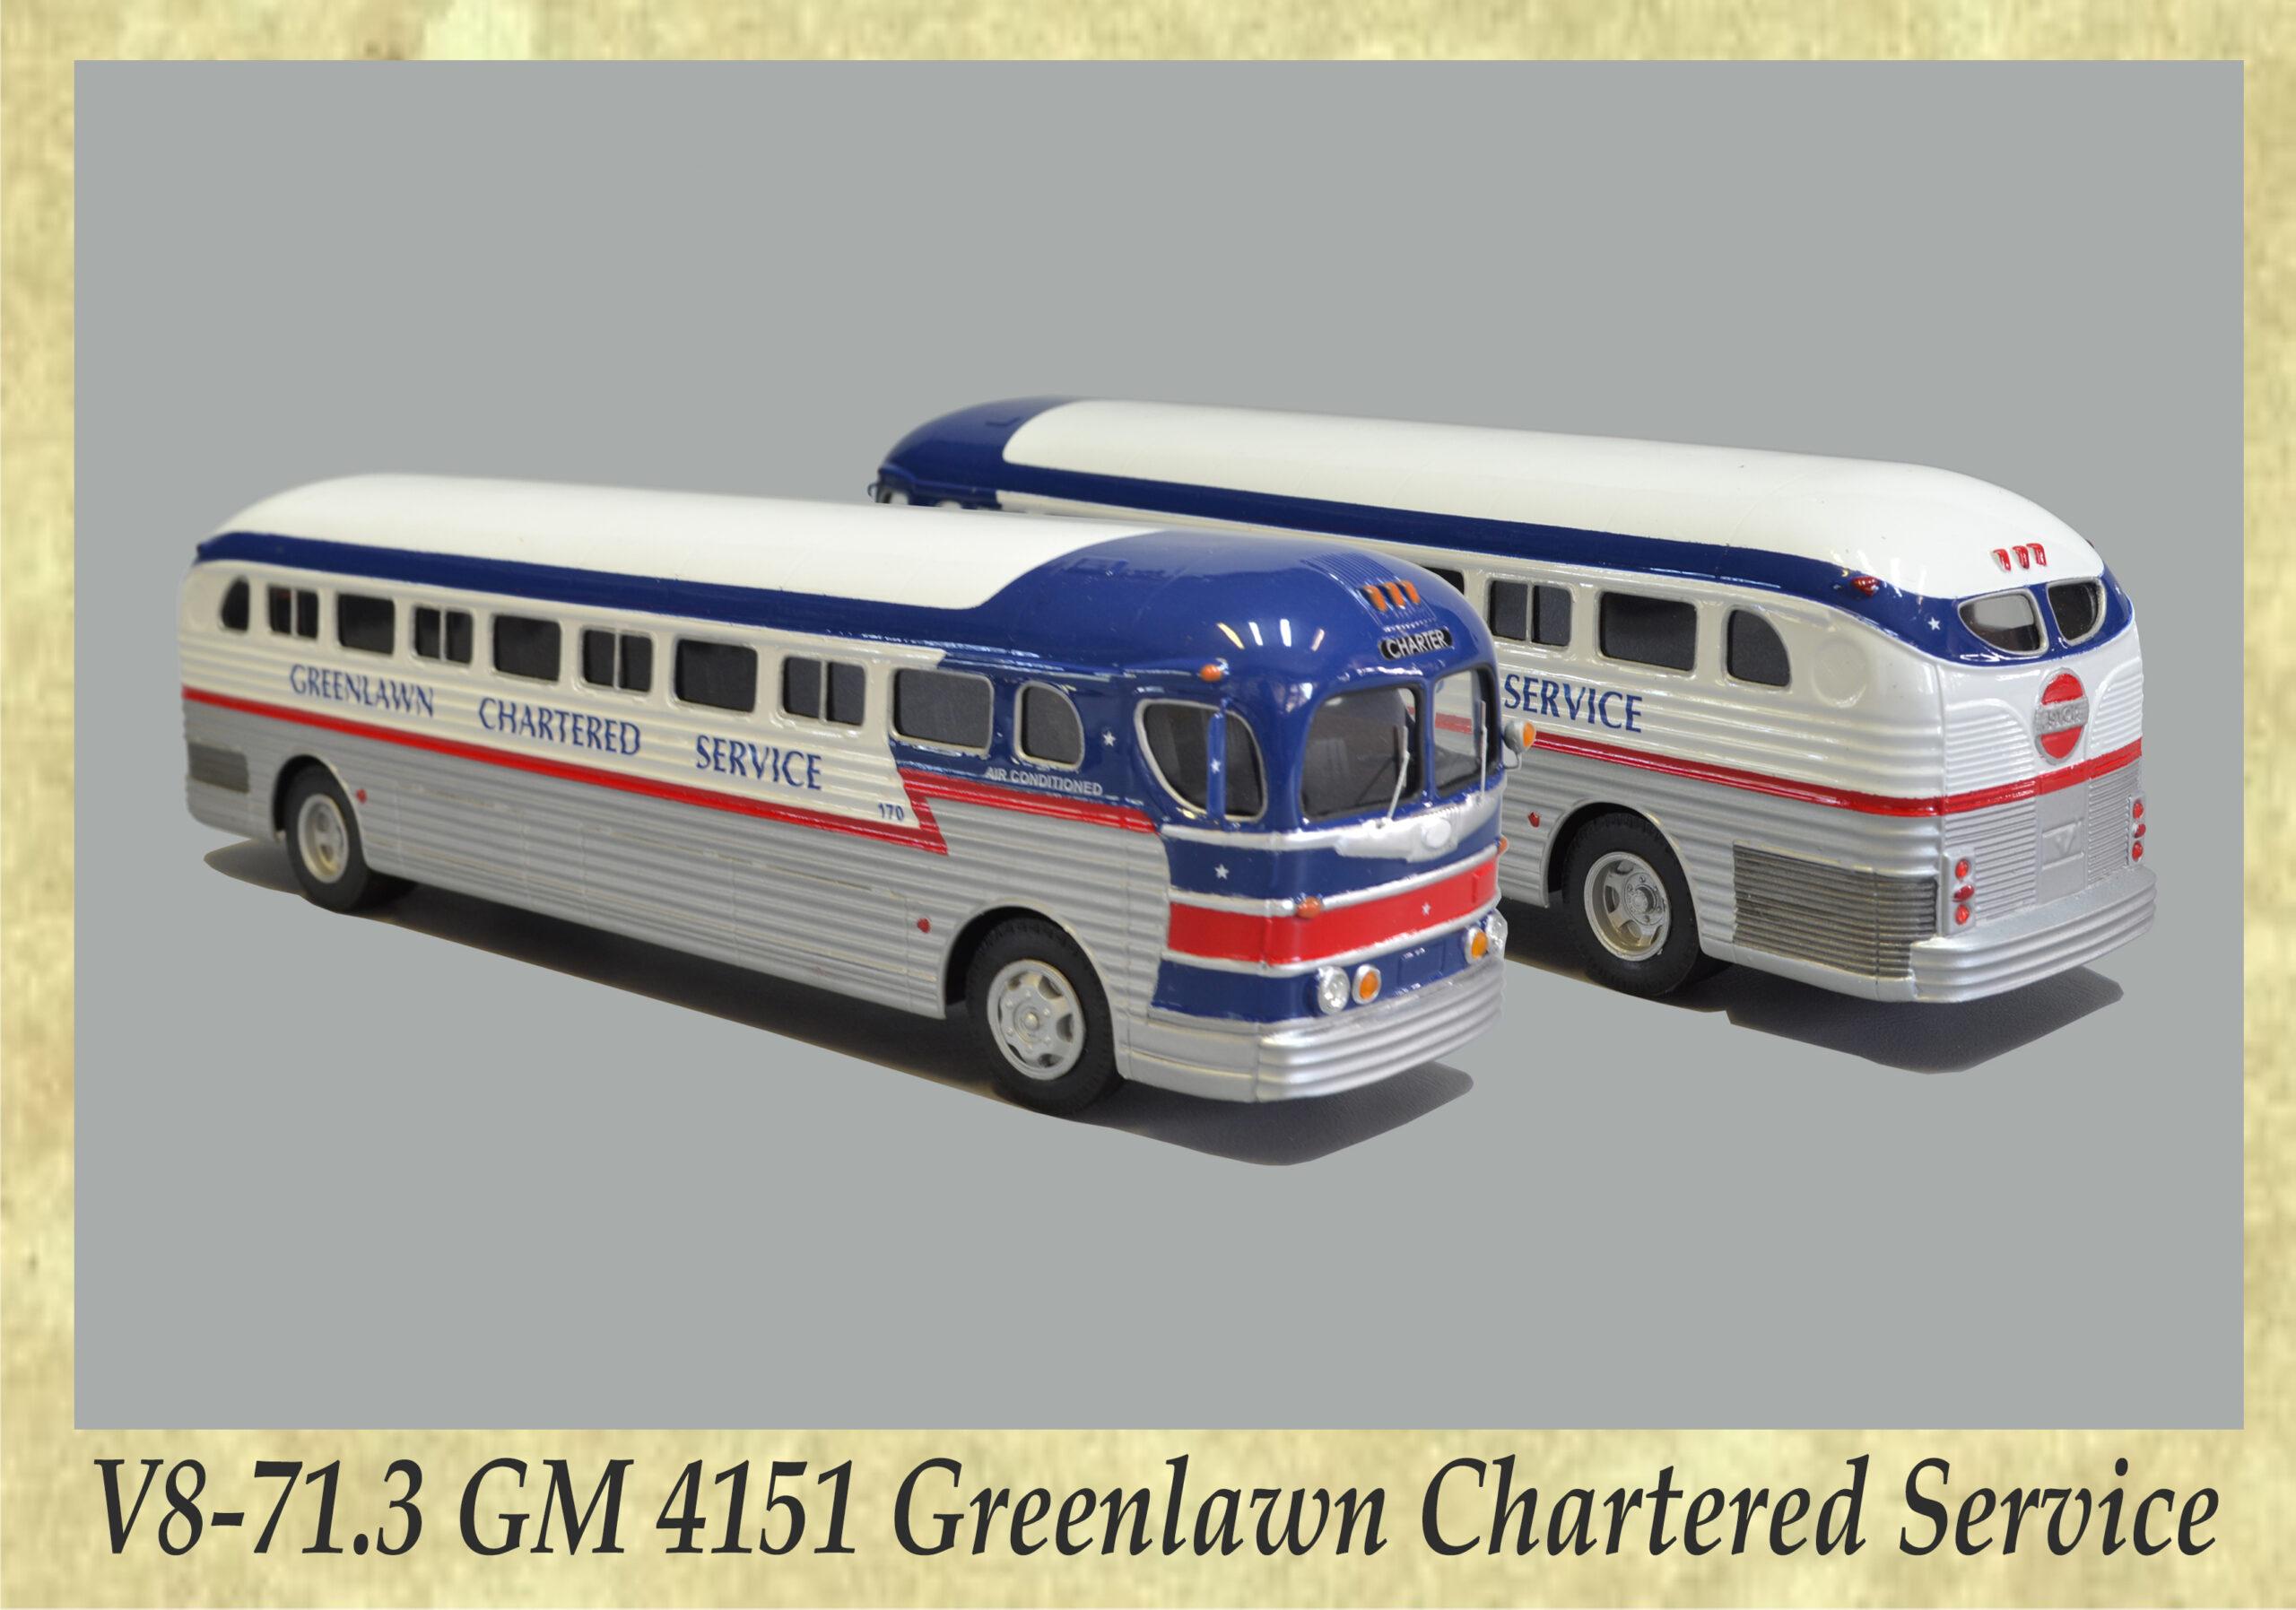 V8-71.3 GM 4151 Greenlawn Chartered Service